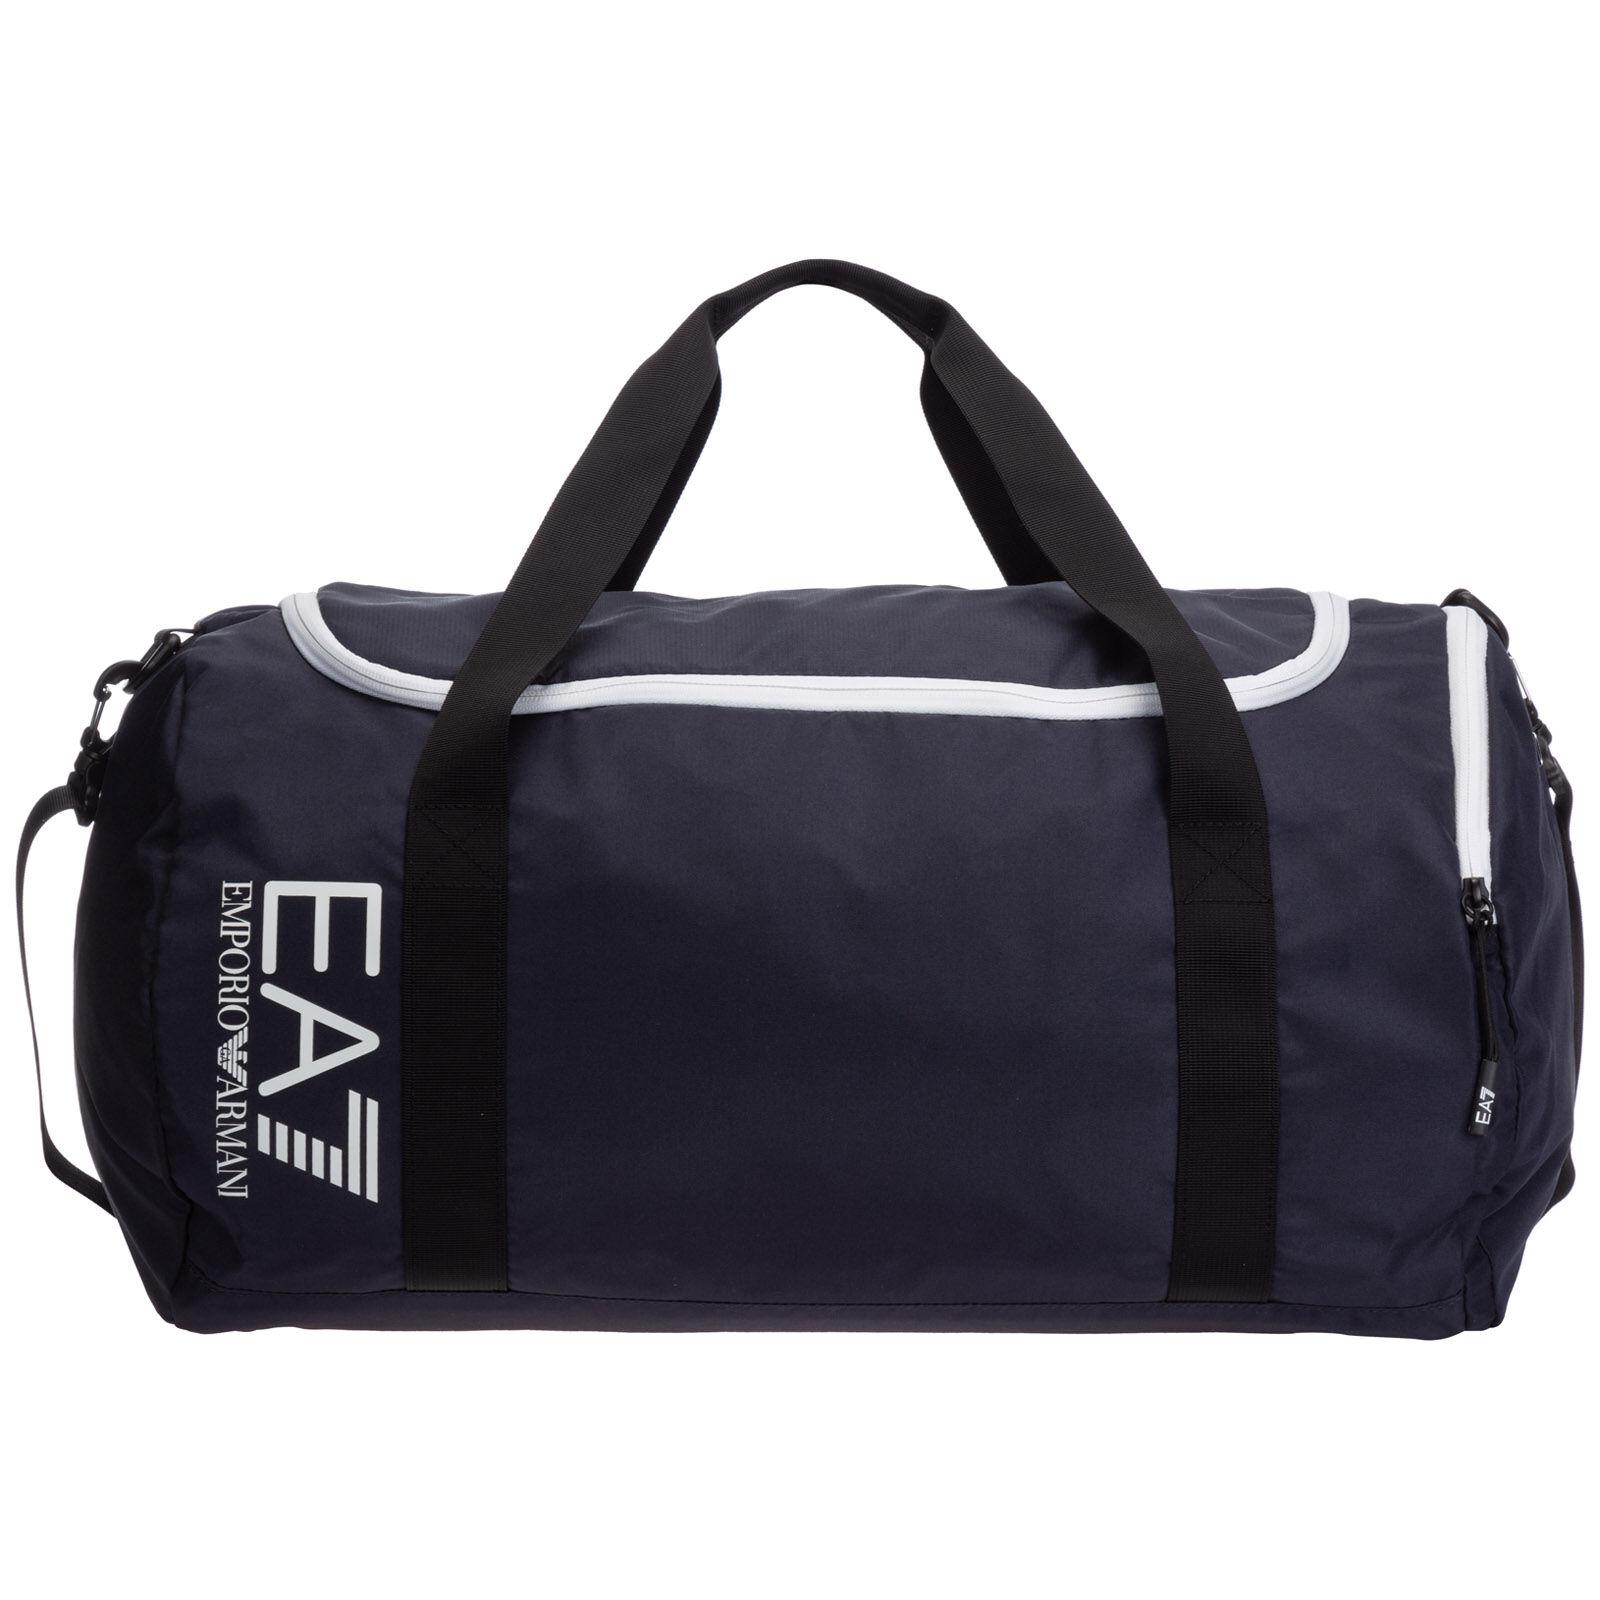 Emporio Armani Men's fitness gym sports shoulder bag  - Blue